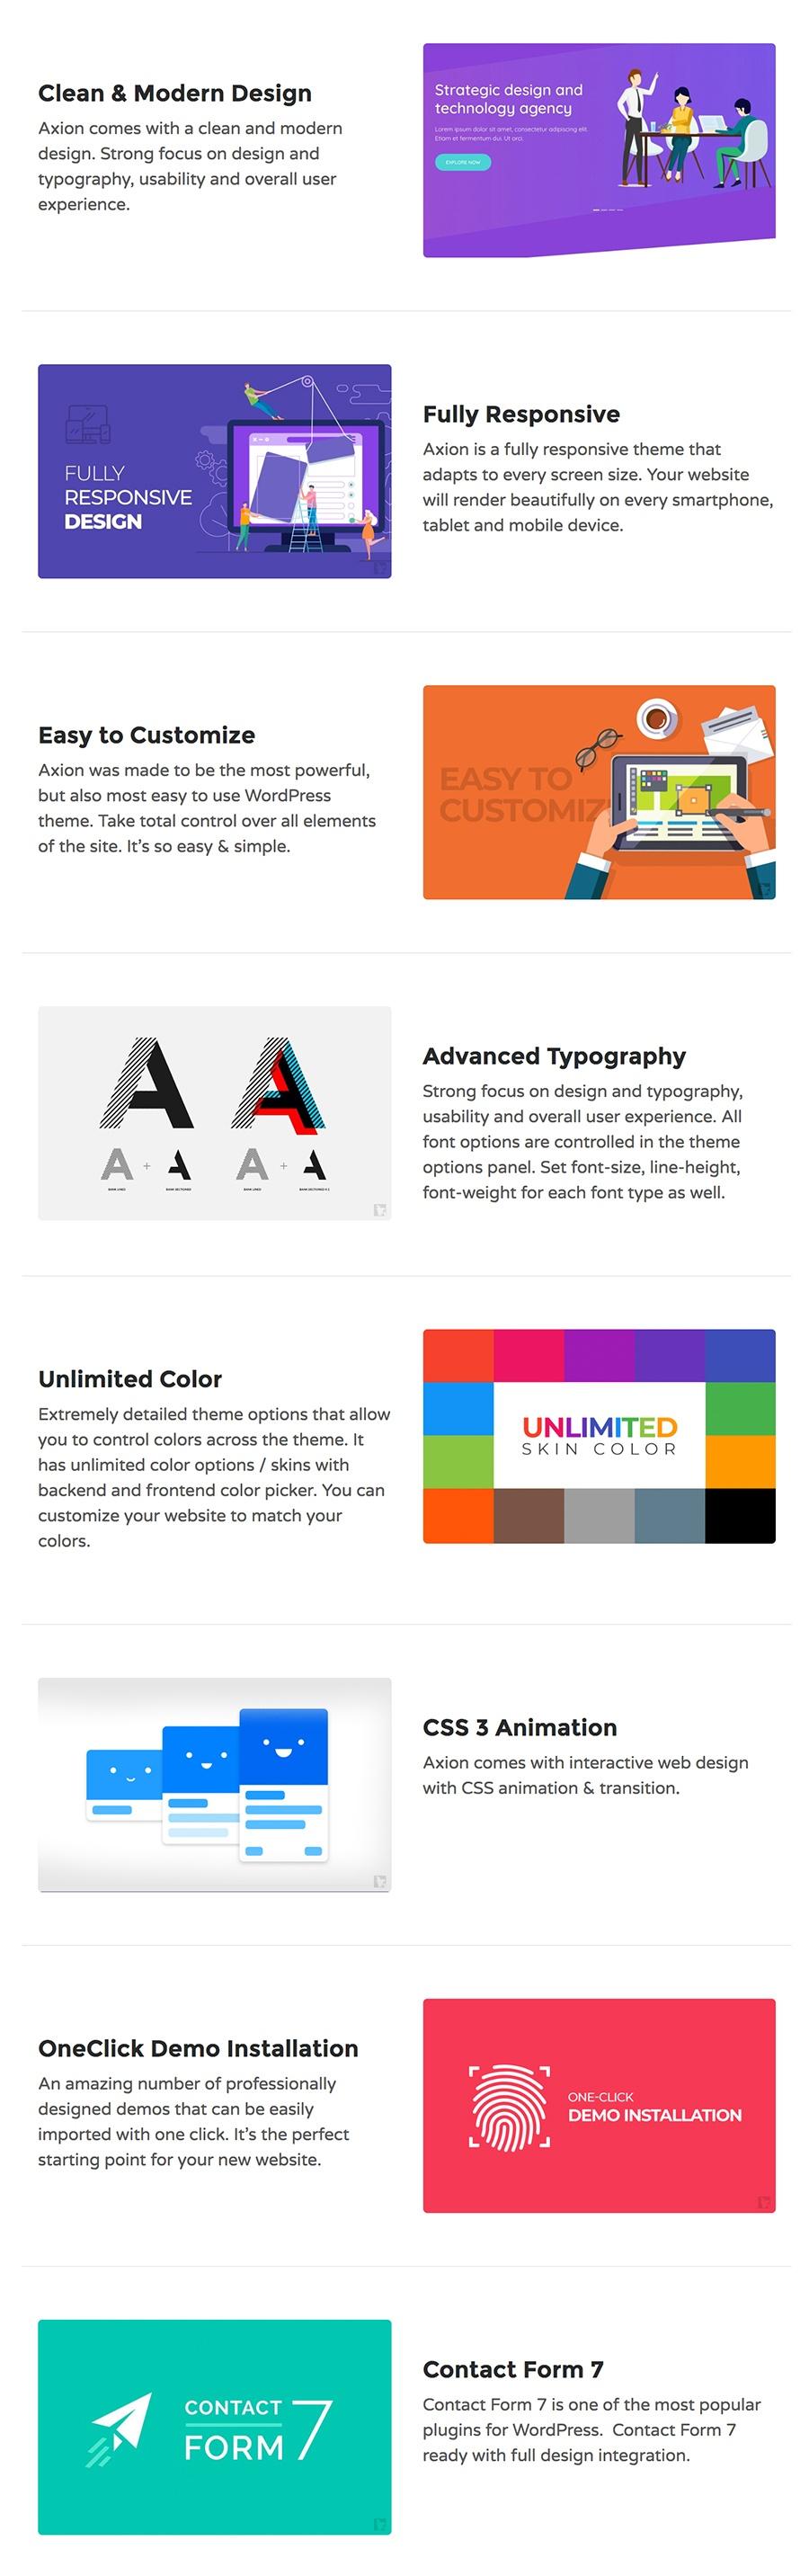 Introducing Axion: Digital Marketing Agency WordPress Theme